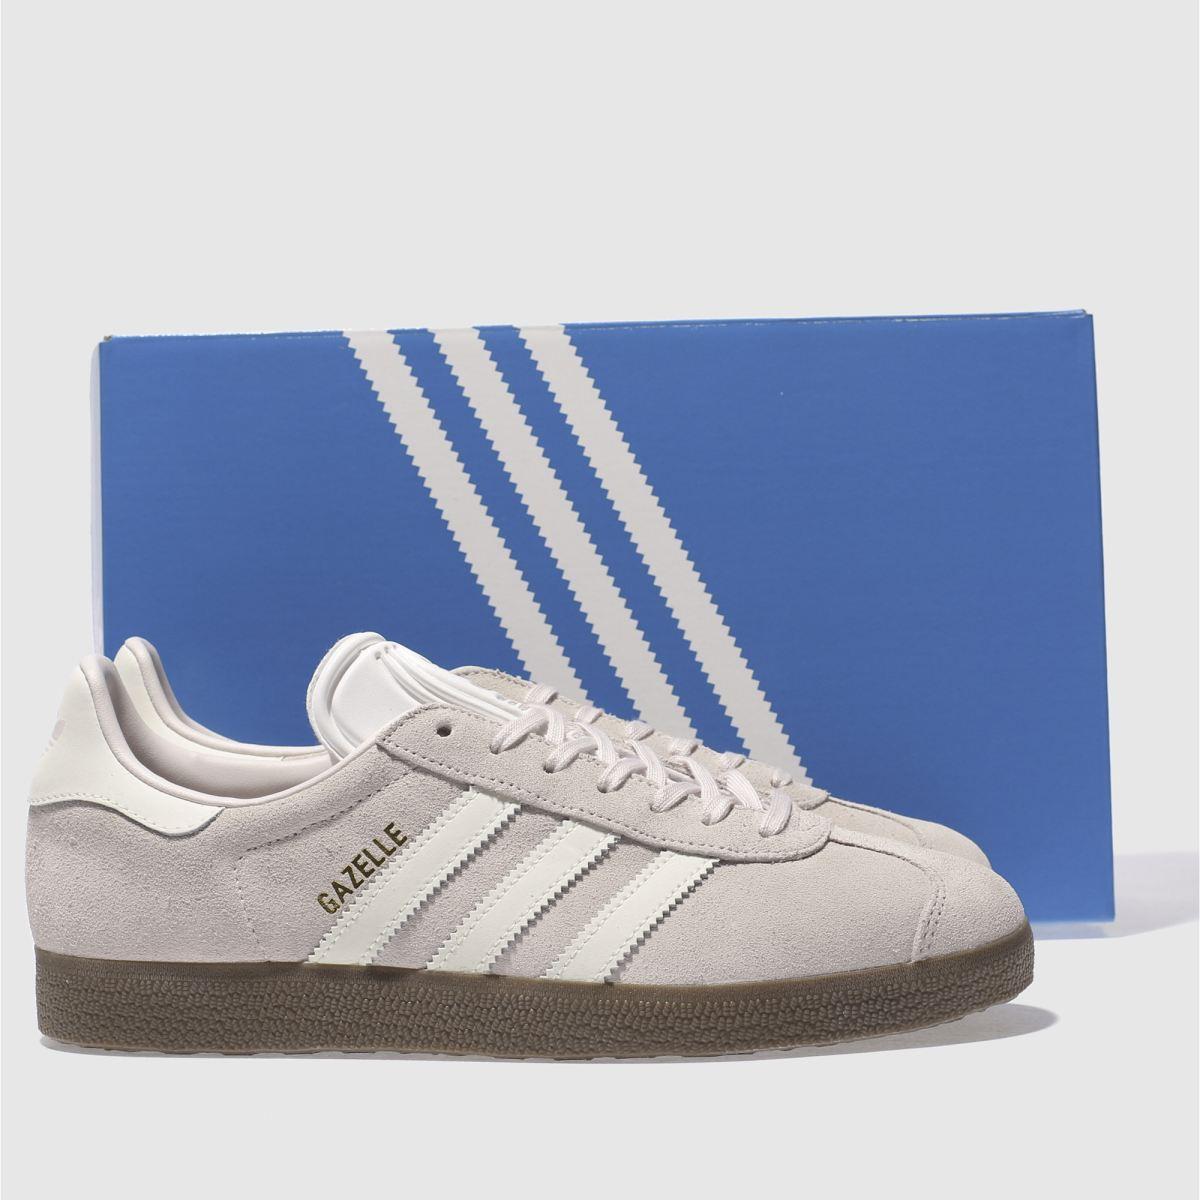 Damen Hellviolett adidas Gazelle Gute Suede Sneaker | schuh Gute Gazelle Qualität beliebte Schuhe a1849b